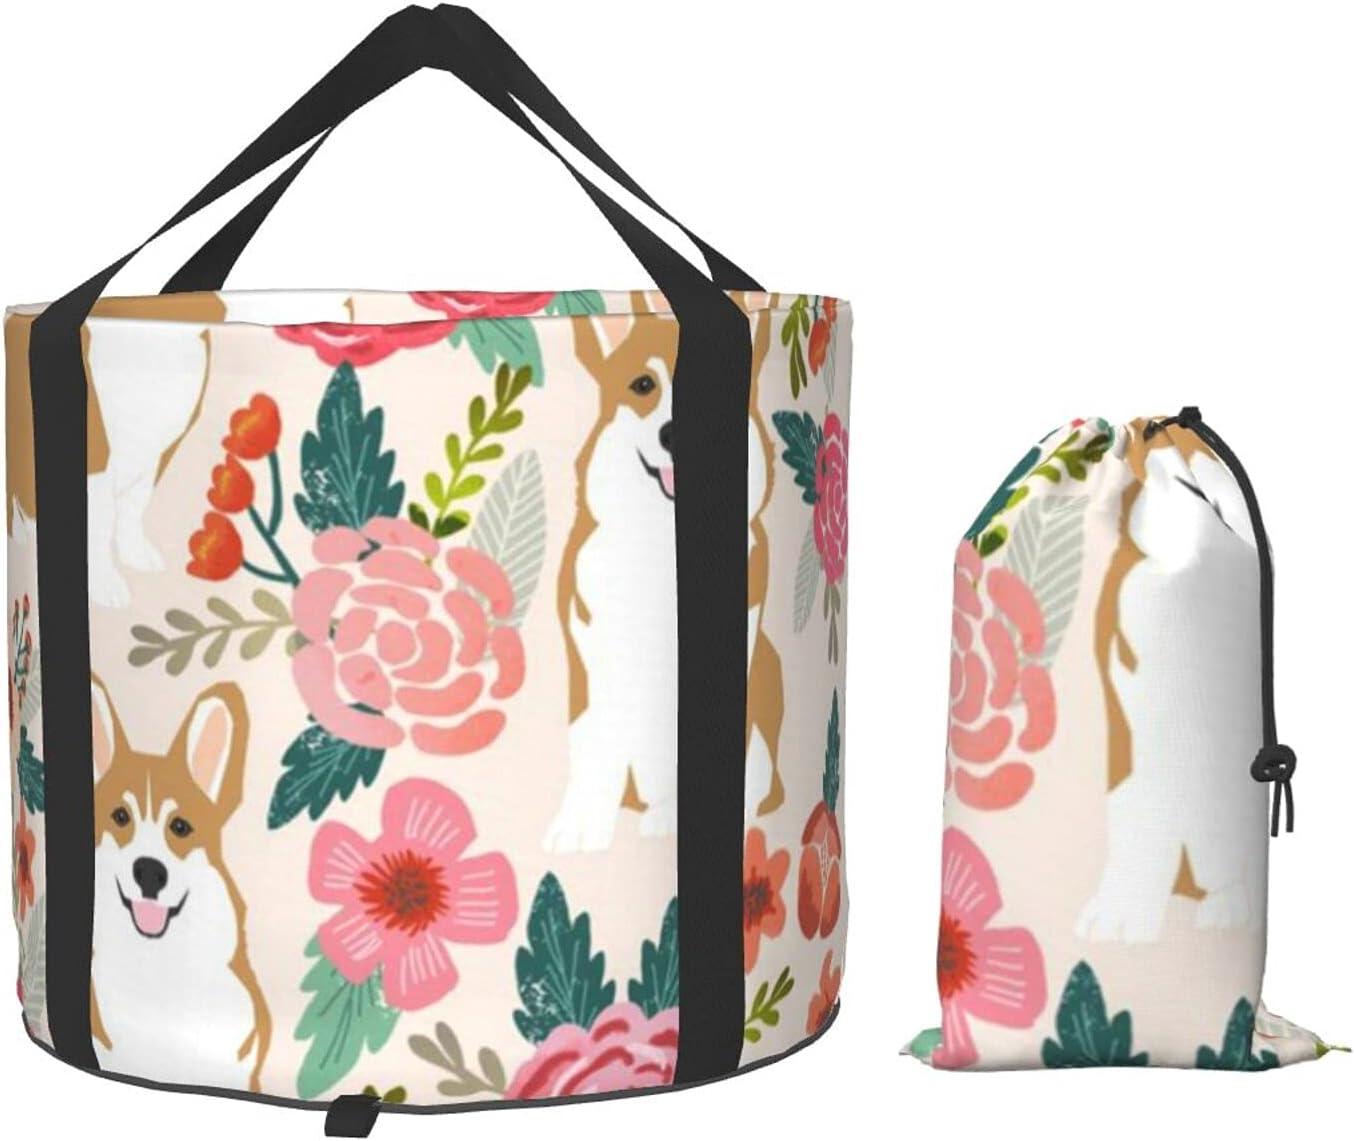 35% OFF VVEGACE Corgi Floral Gorgeous Flowers Spring Multifun Bucket Collapsible